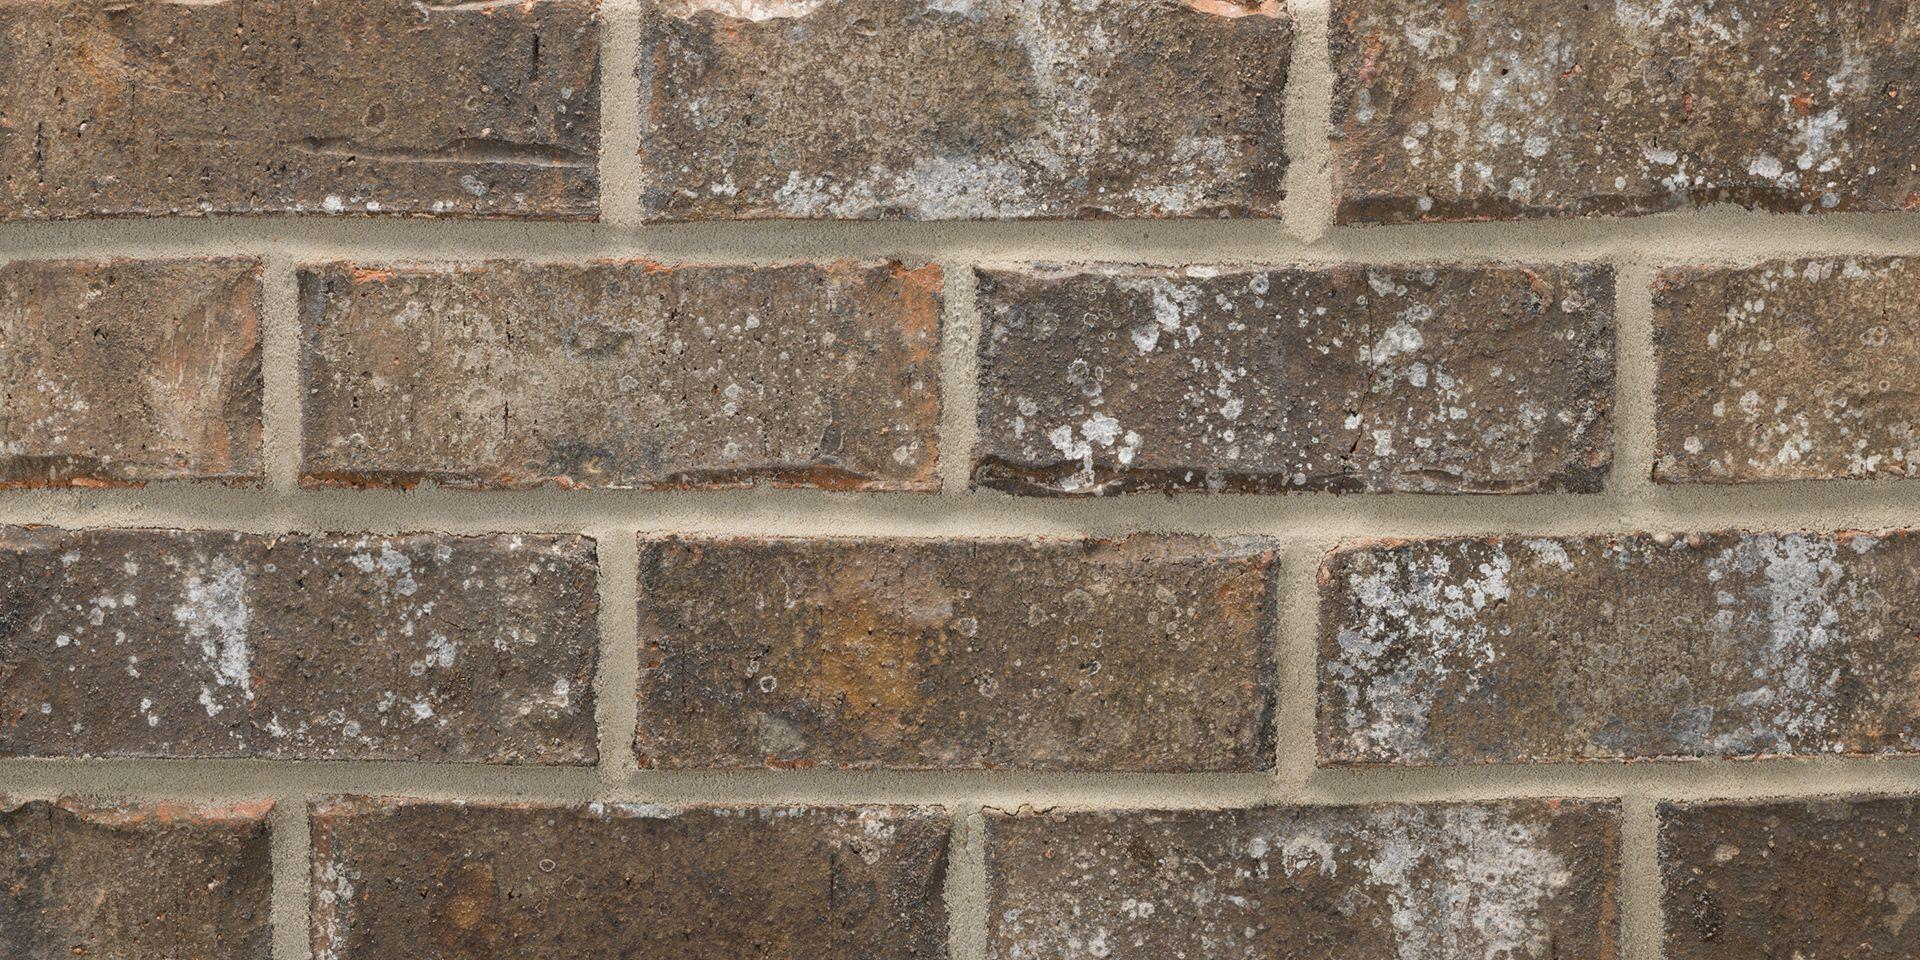 Acme Brick Rockwell Exterior Inspiration In 2019 Brick